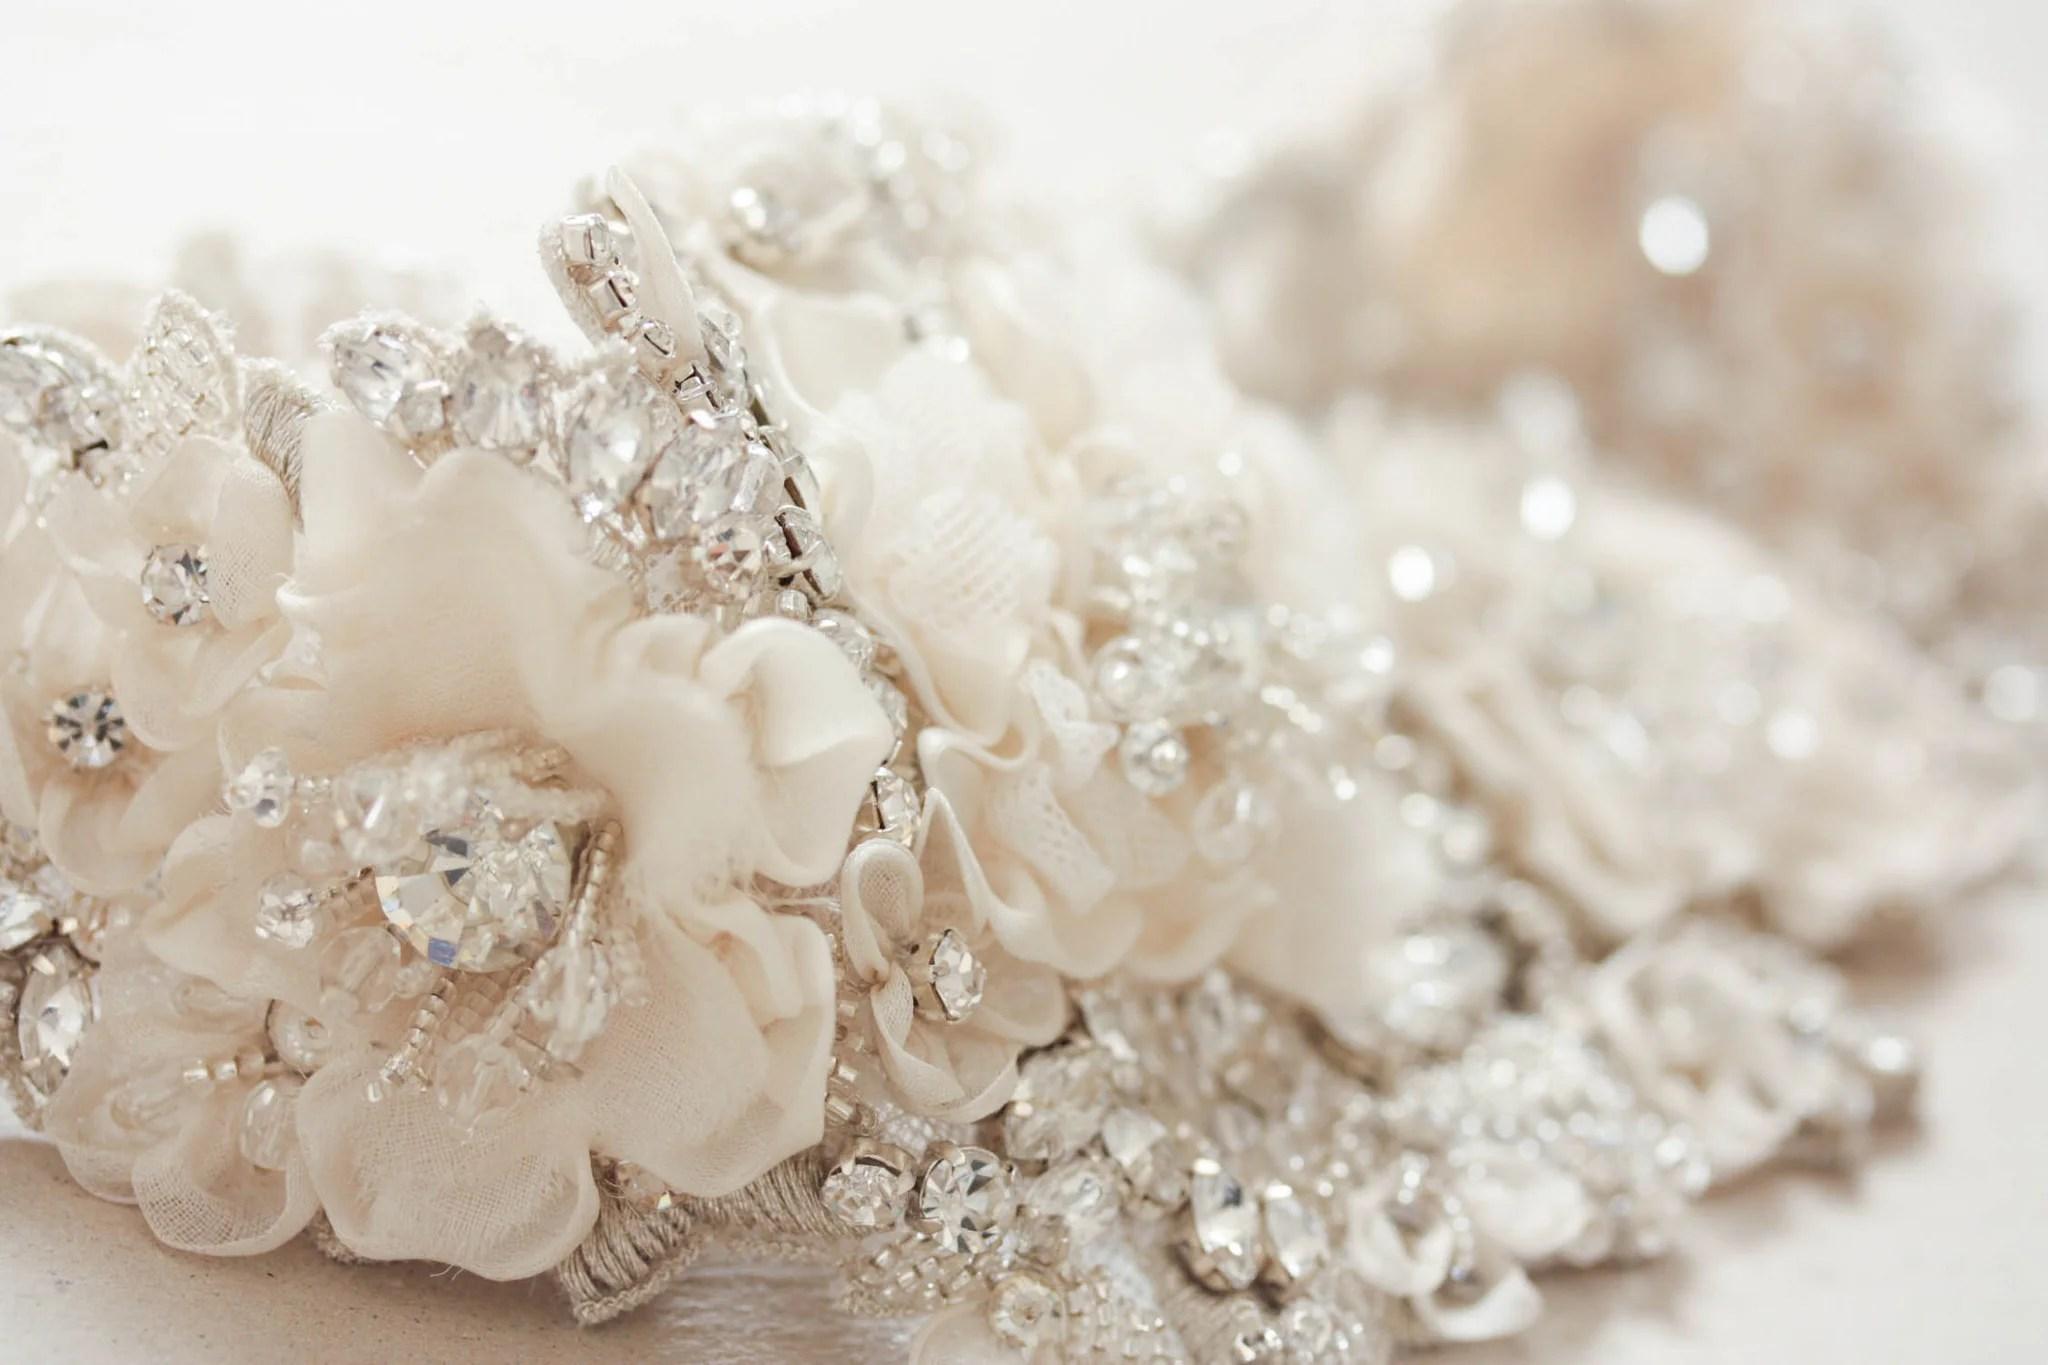 dress sash wedding belts for dresses Bridal belt Roma 17 inches S02